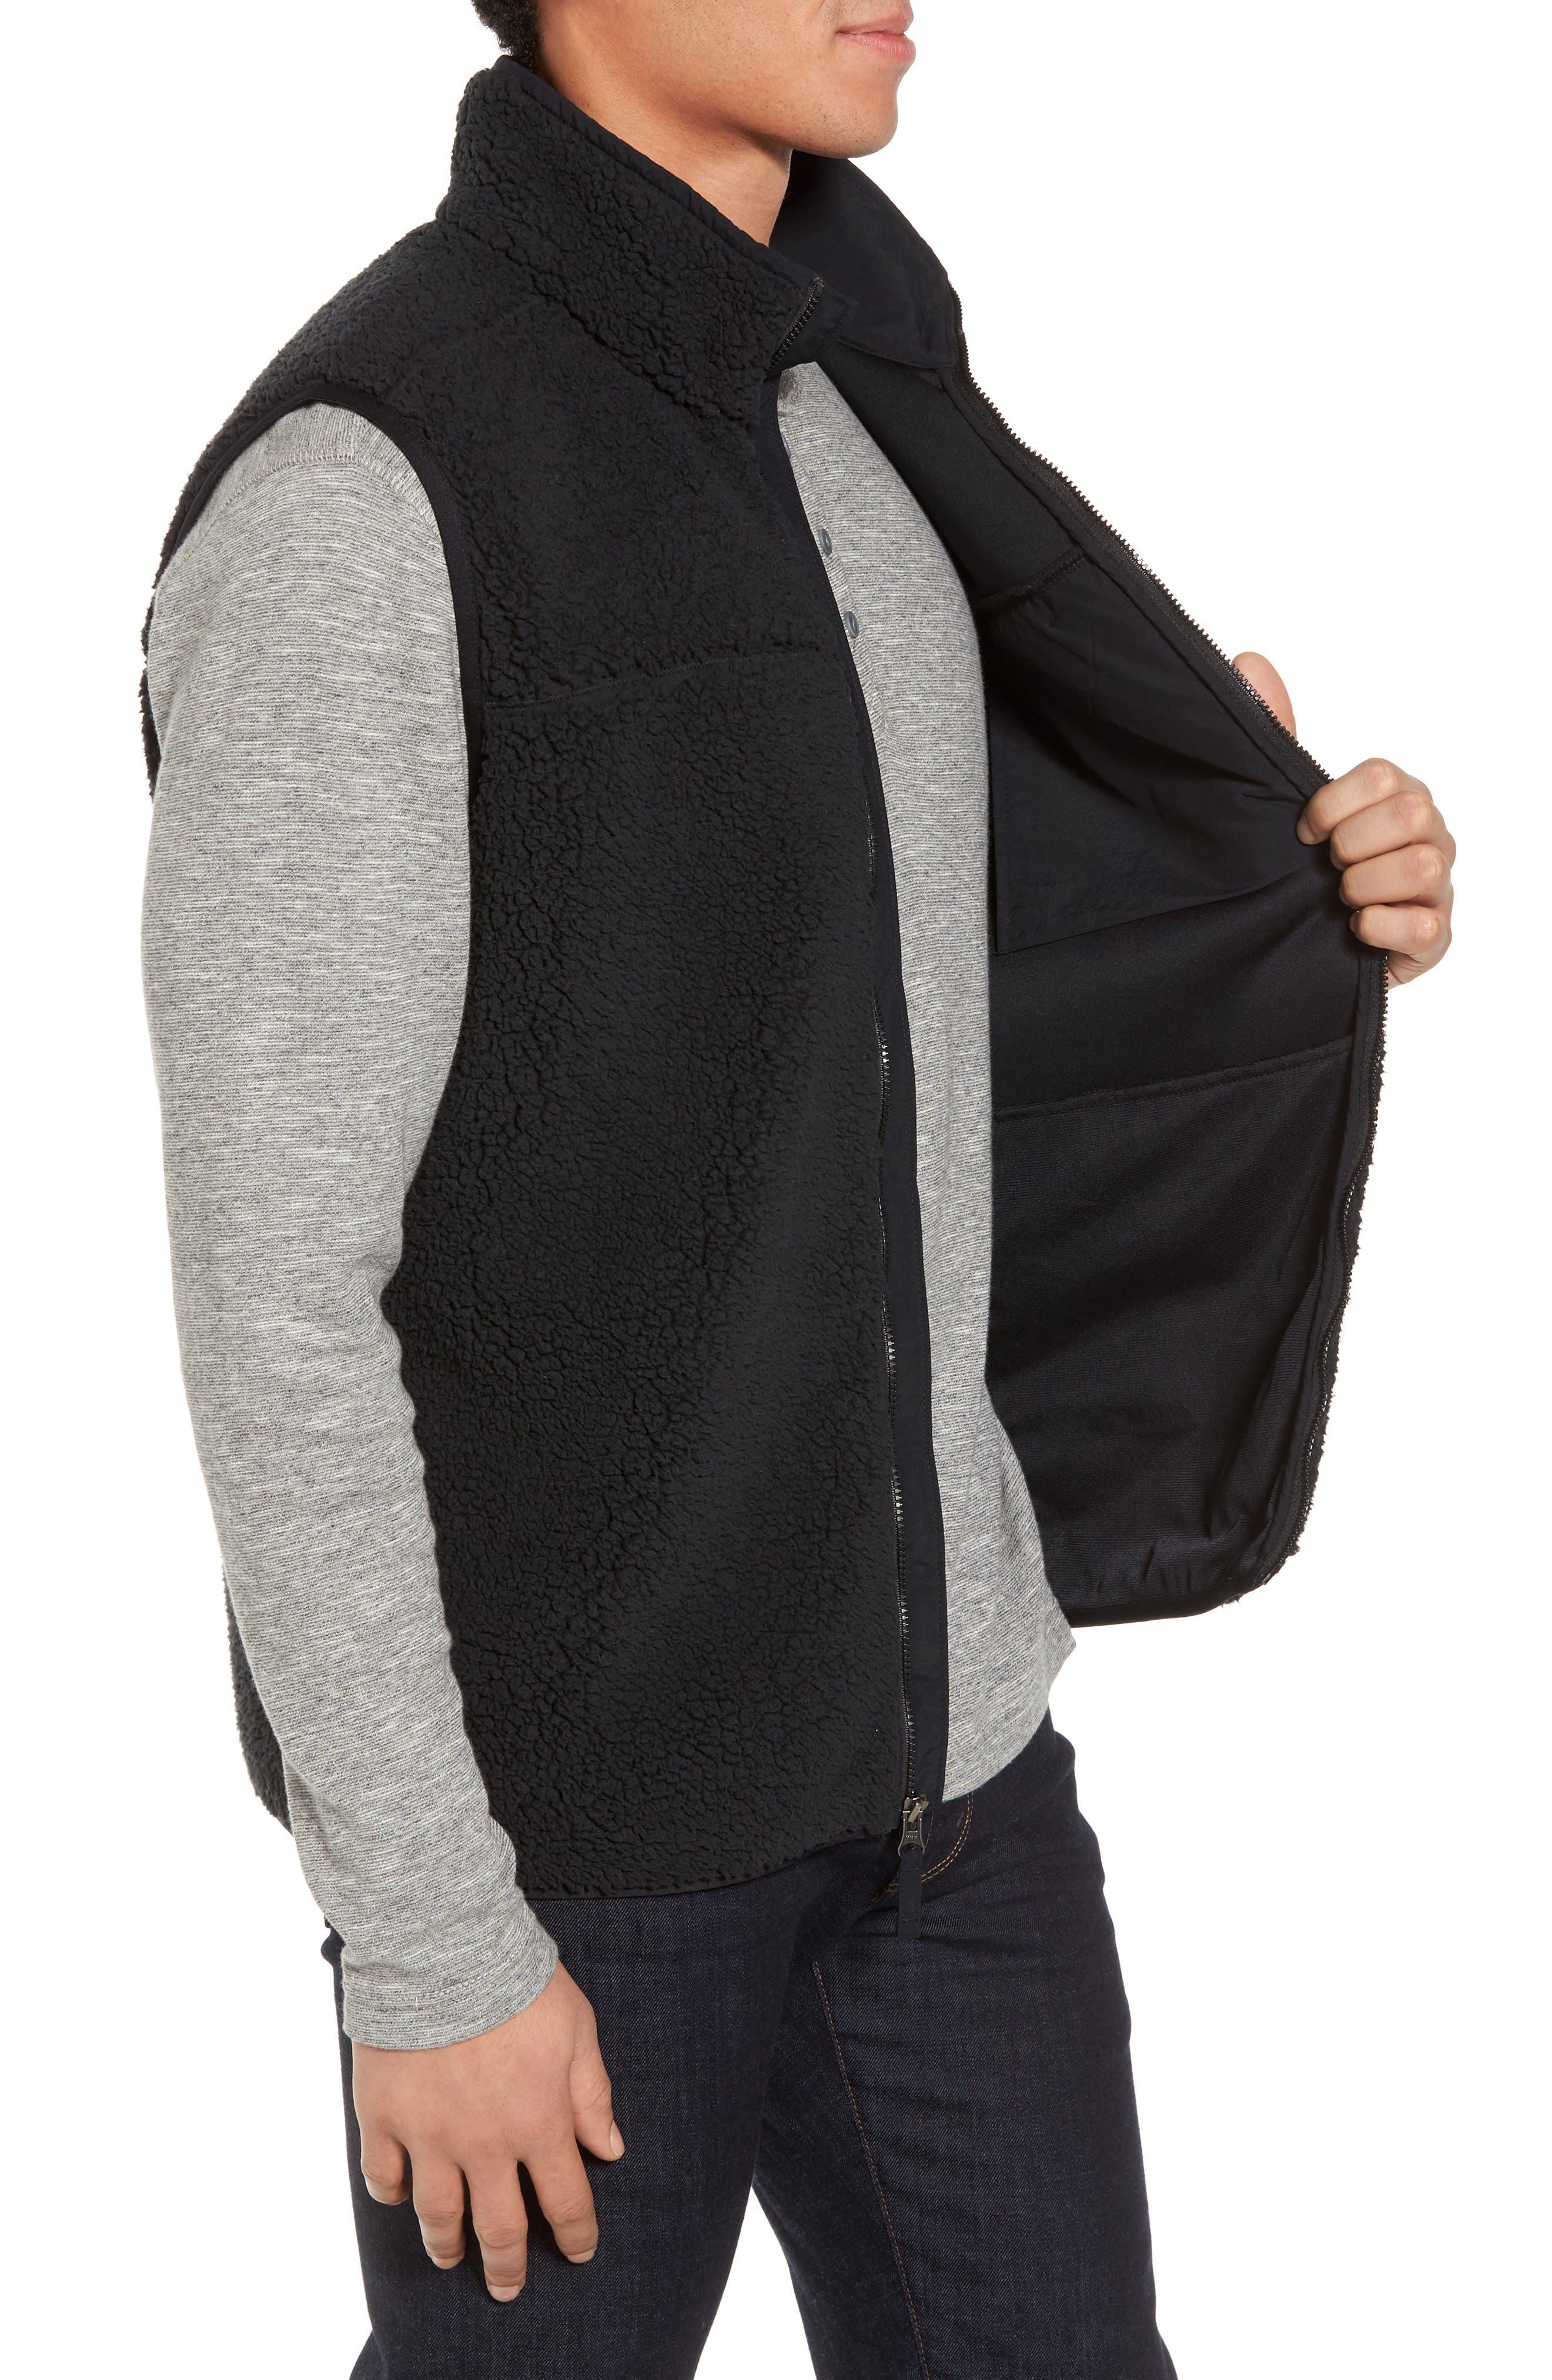 Sportswear Harborside Heavyweight Fleece Vest,                             Alternate thumbnail 3, color,                             010